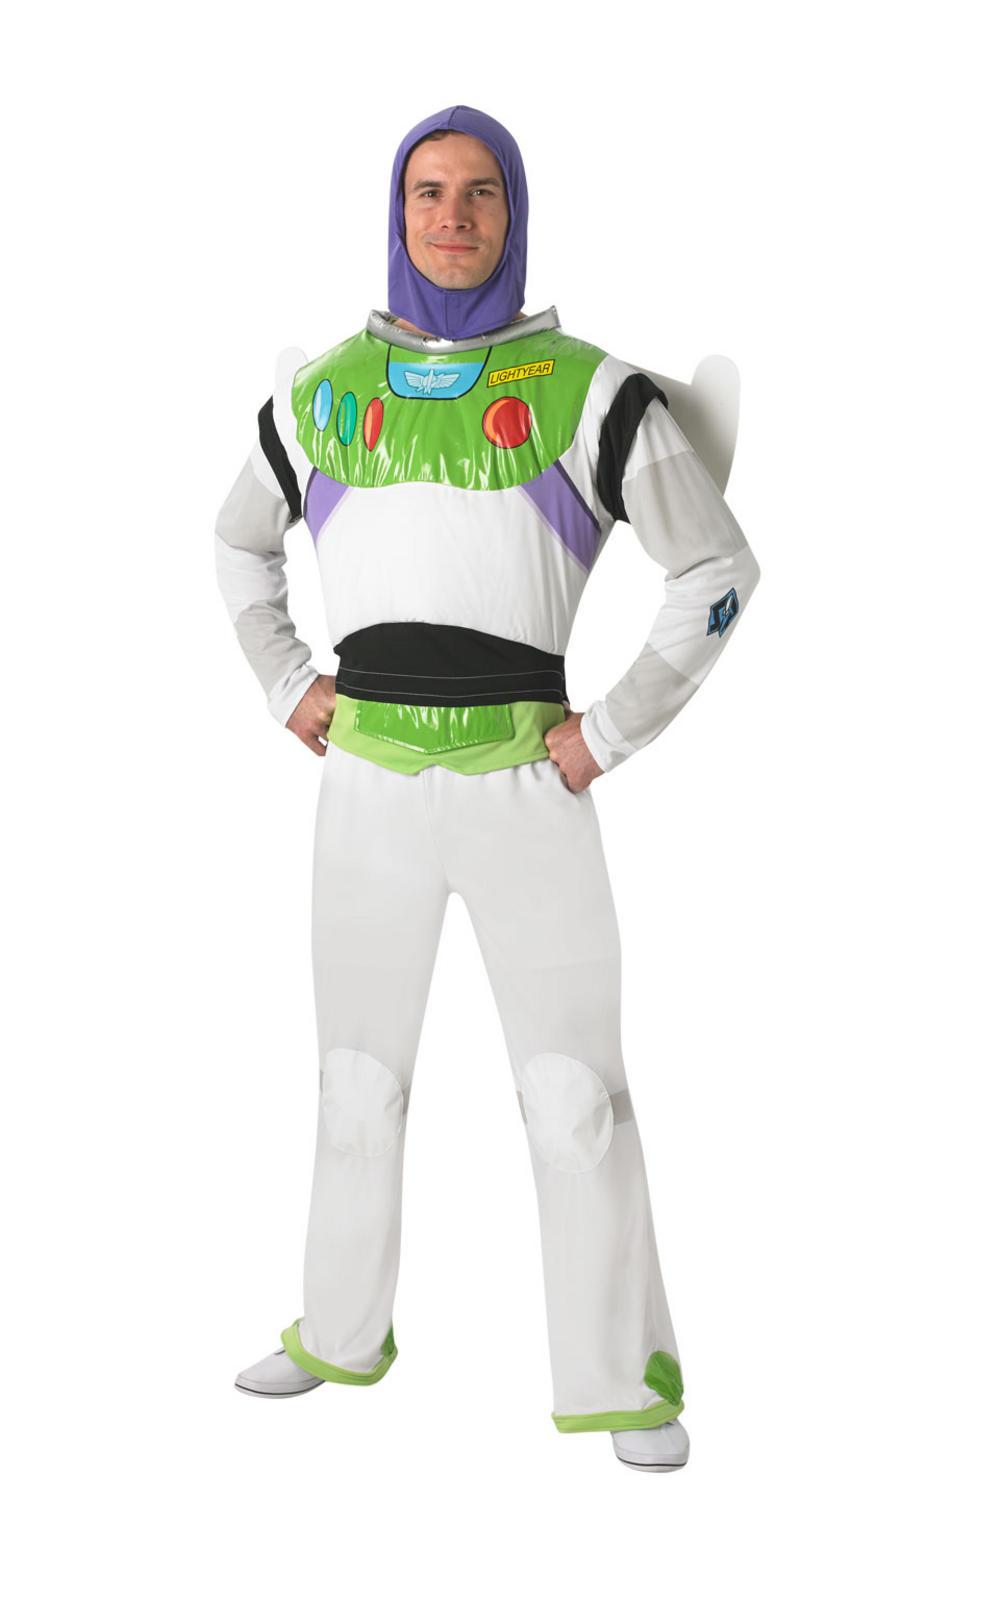 Buzz Lightyear Adult's Costume